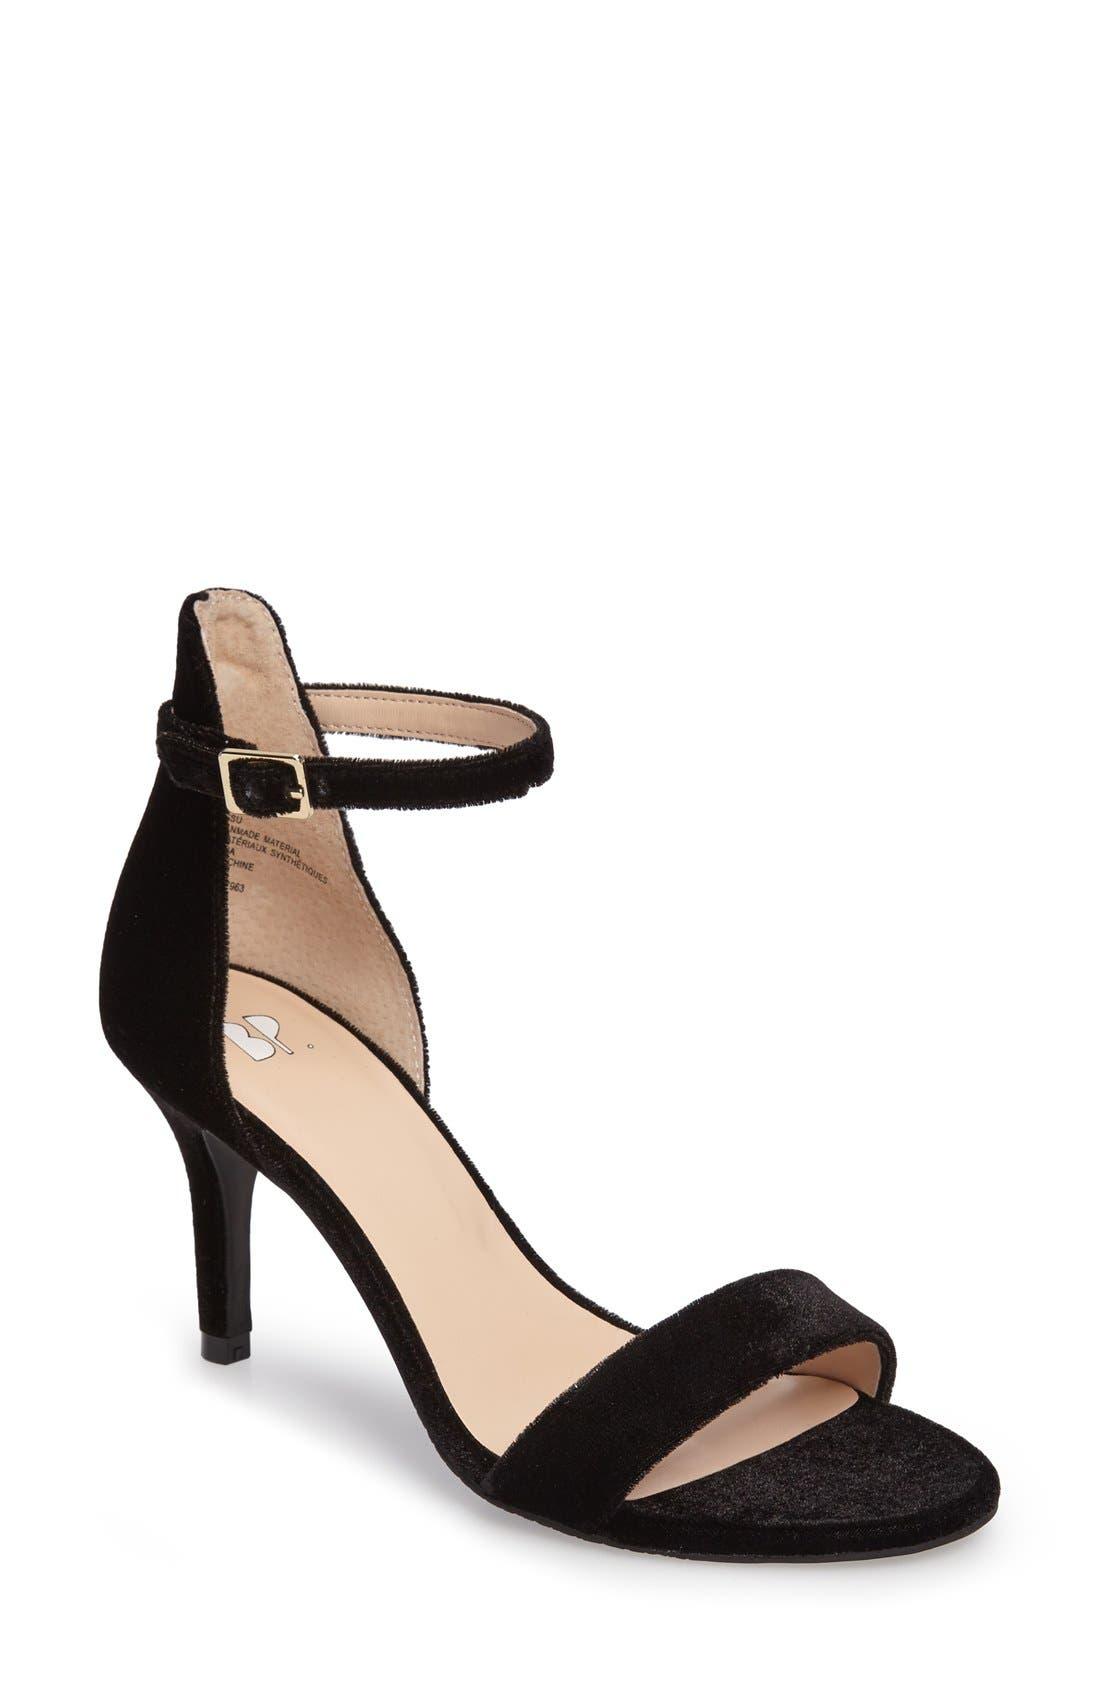 Main Image - BP. 'Luminate' Open Toe Dress Sandal (Women)